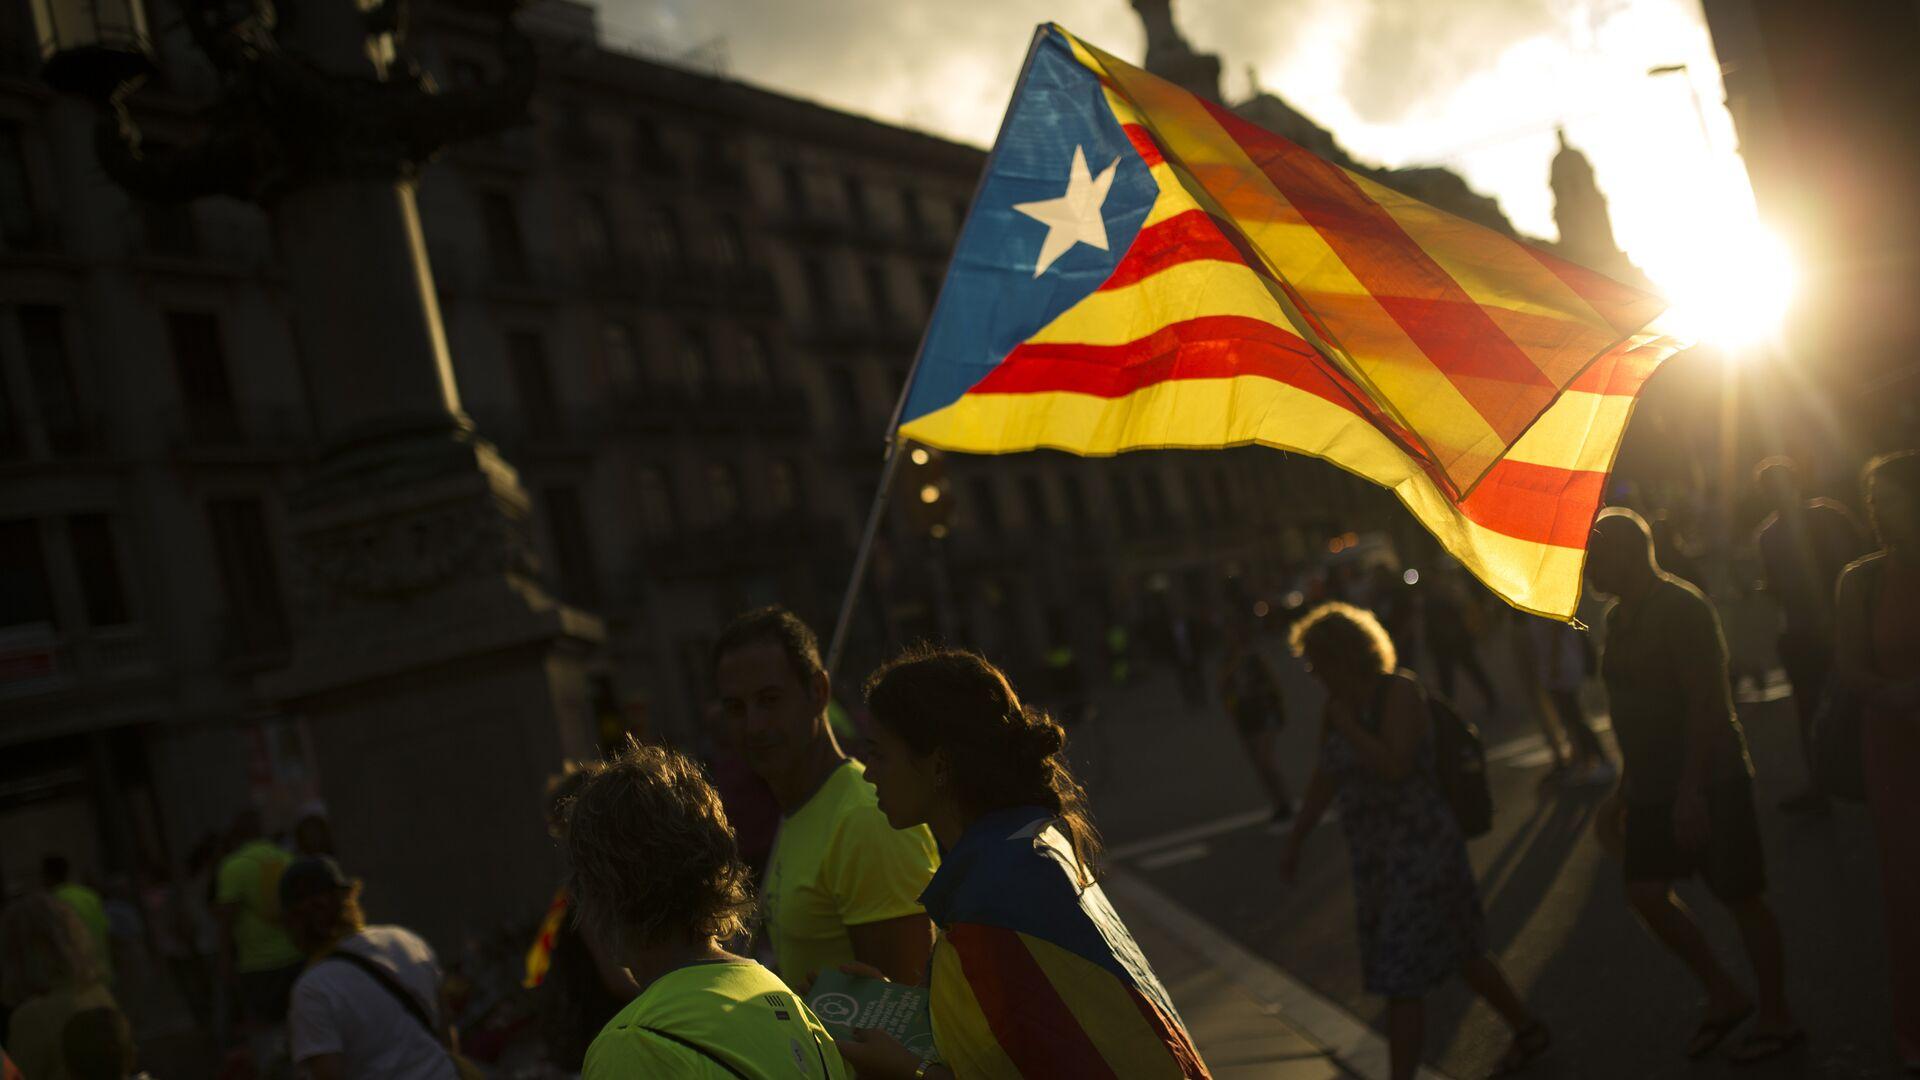 Estelada, bandera independentista de Cataluña - Sputnik Mundo, 1920, 29.06.2021